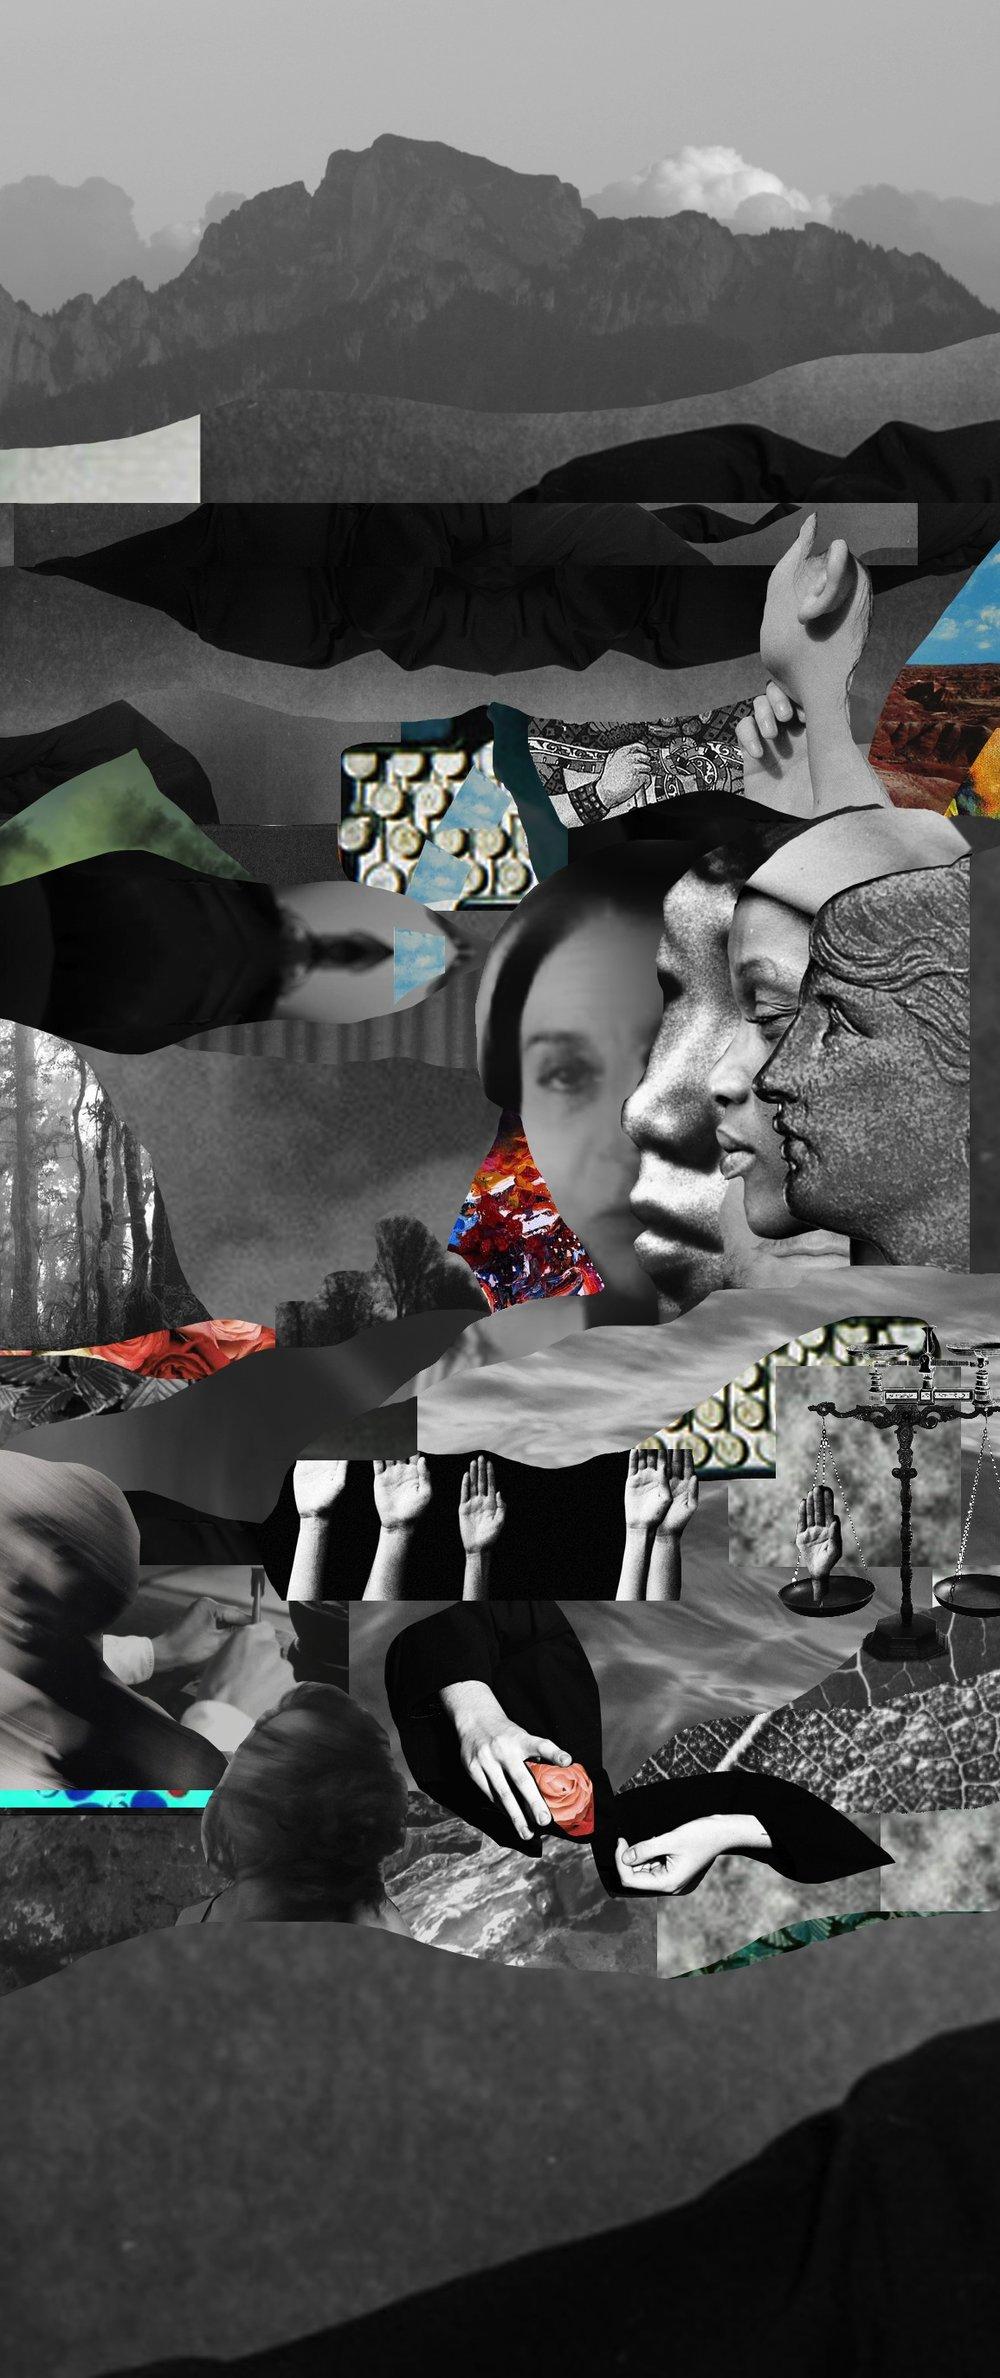 © Collages - Julie Sando